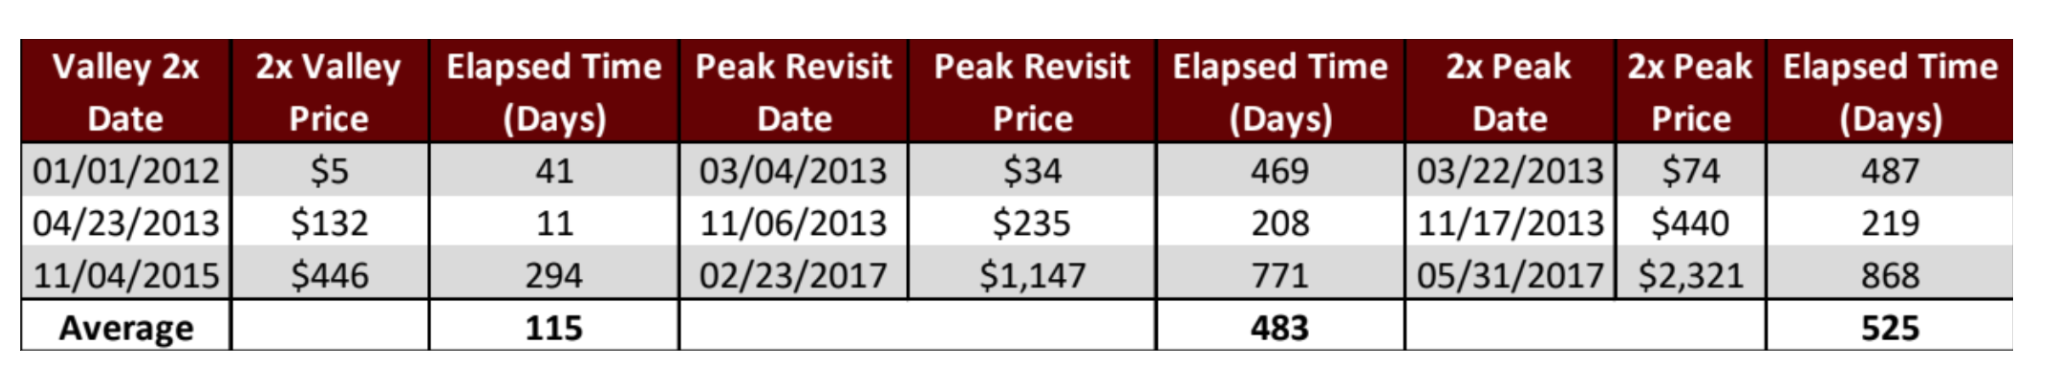 BTC 高点与低点对比